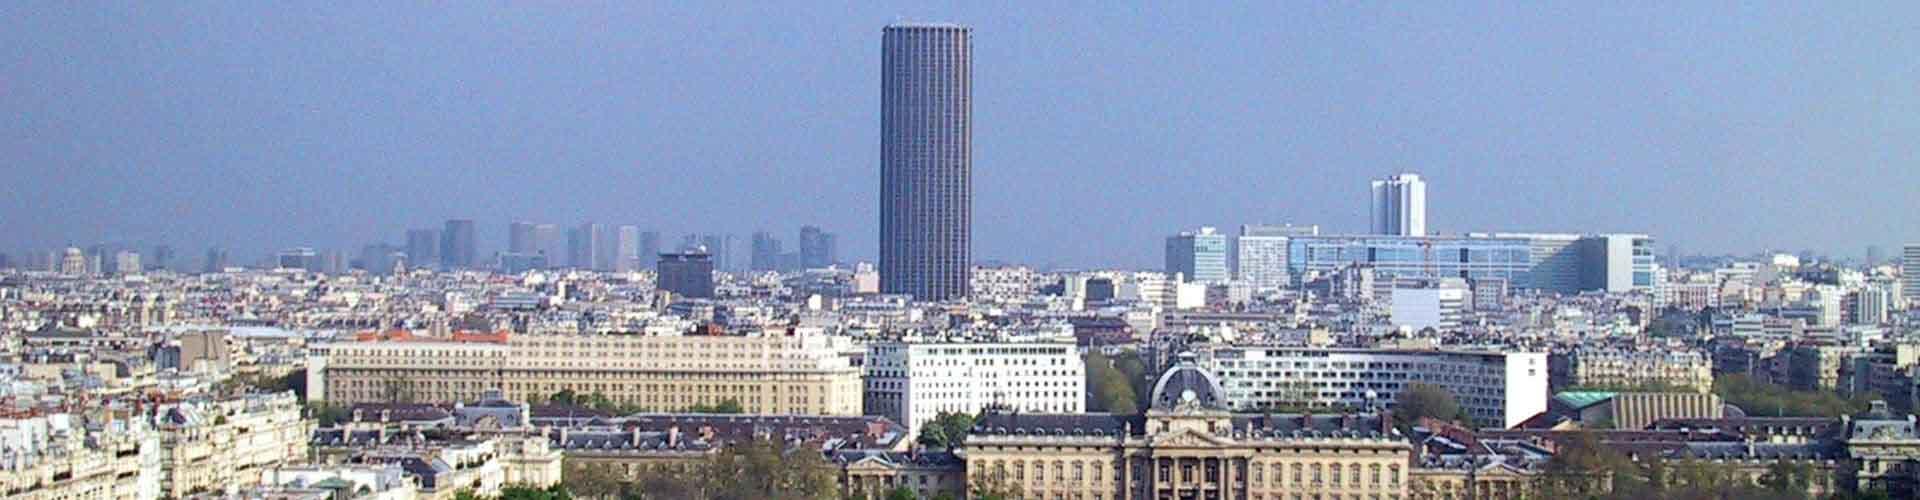 Paris auberges paris - Paris auberge de jeunesse ...